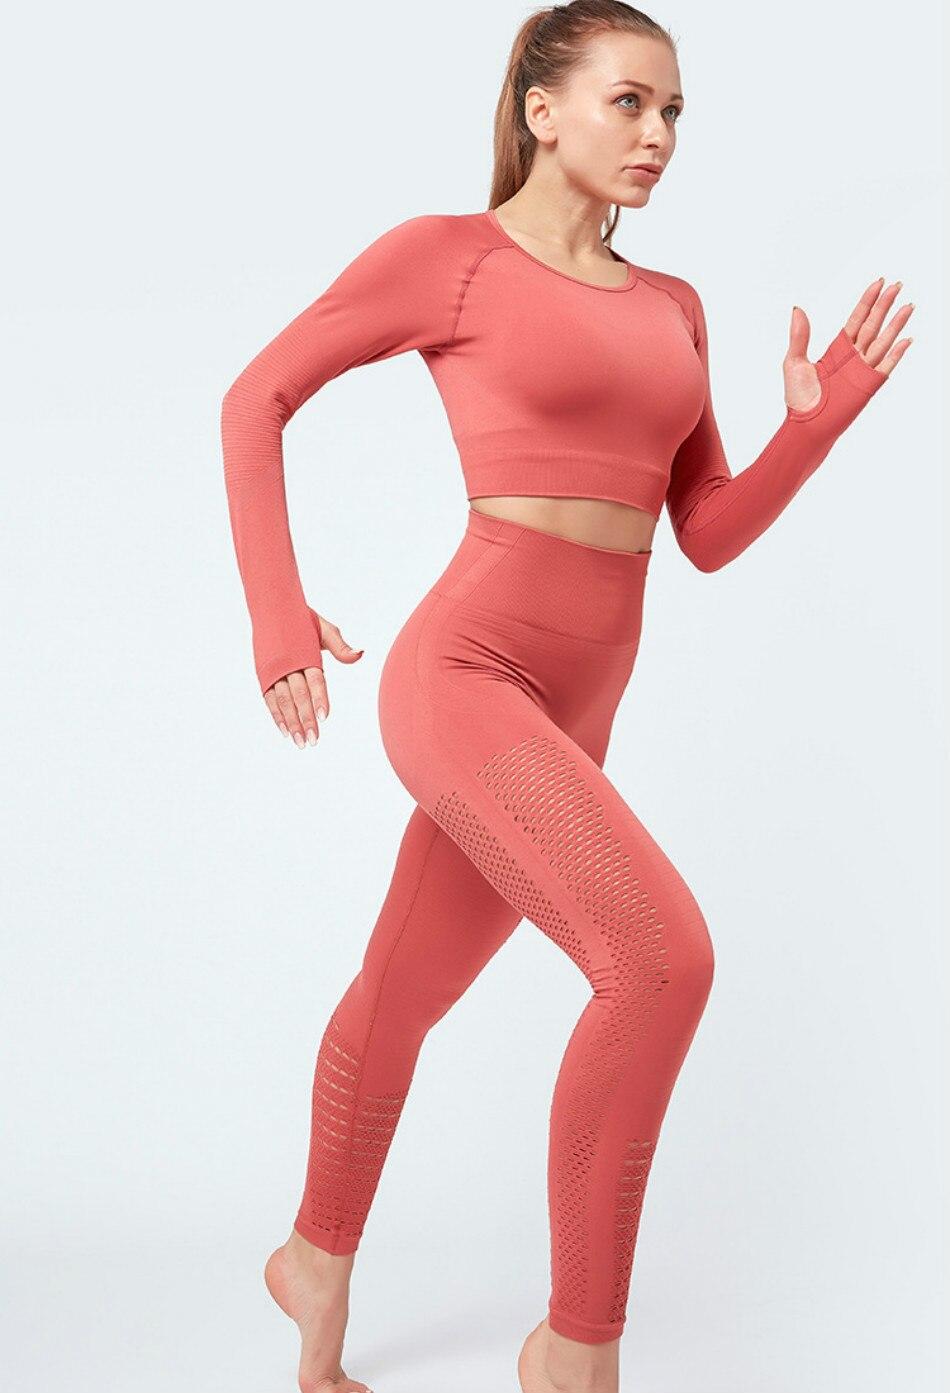 costura manga longa ginásio mulher camisa esporte